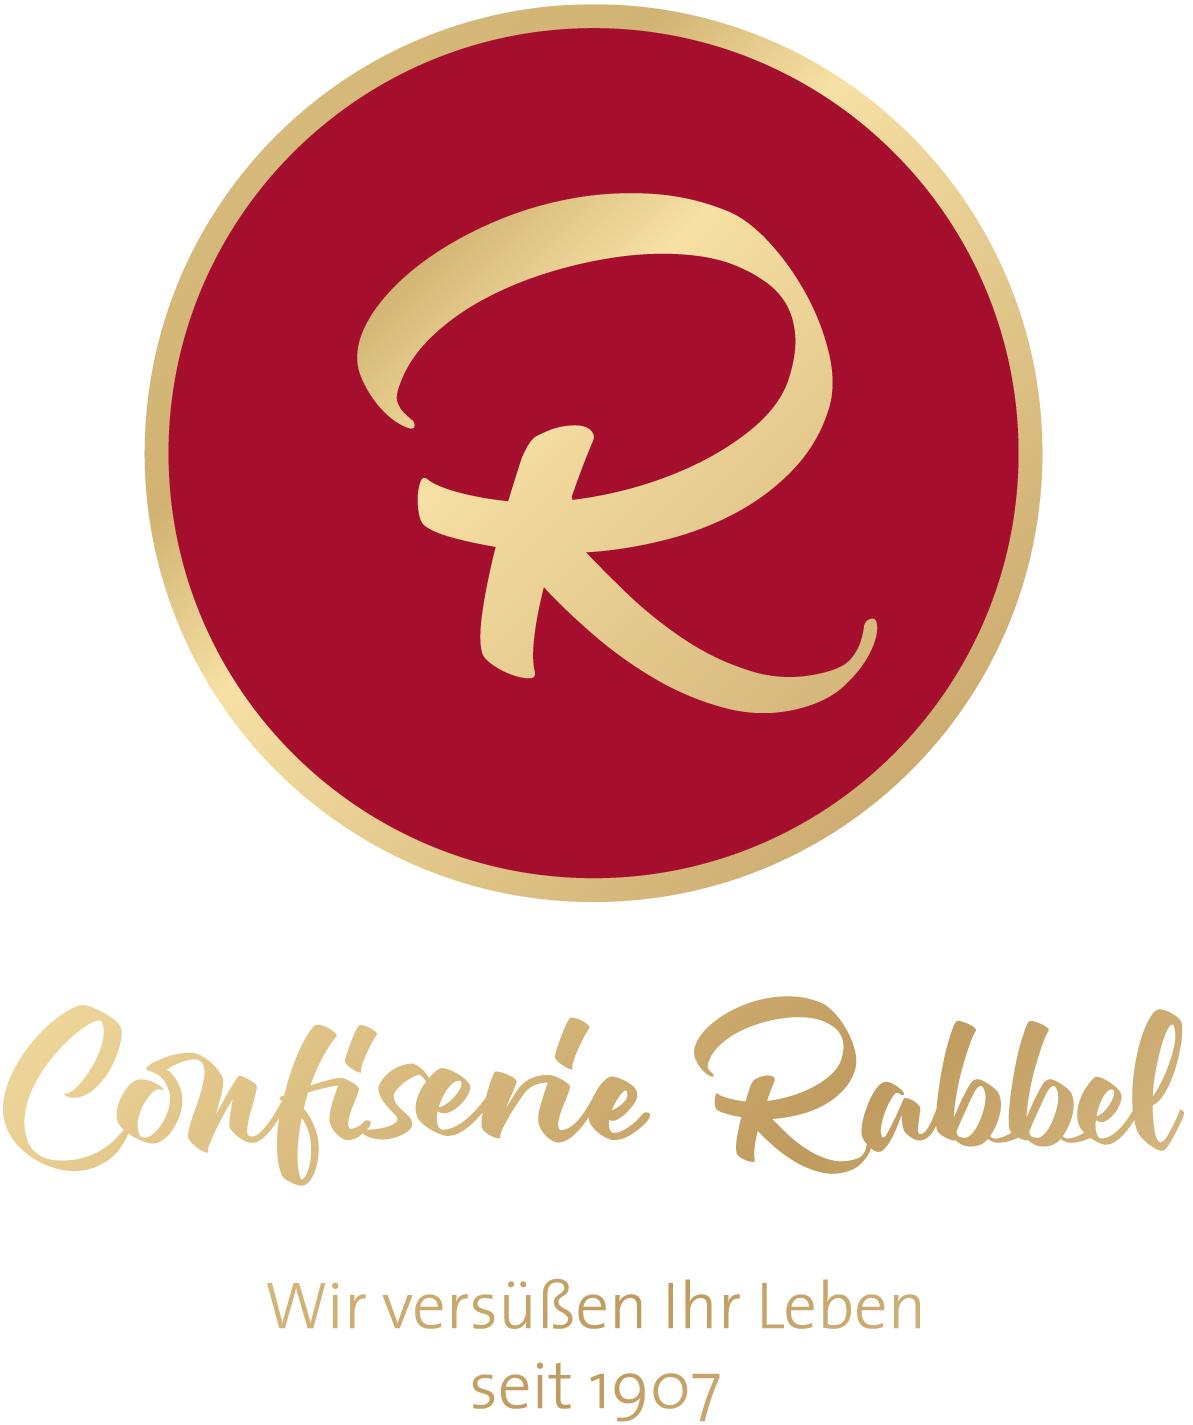 Confiserie Rabbel GmbH